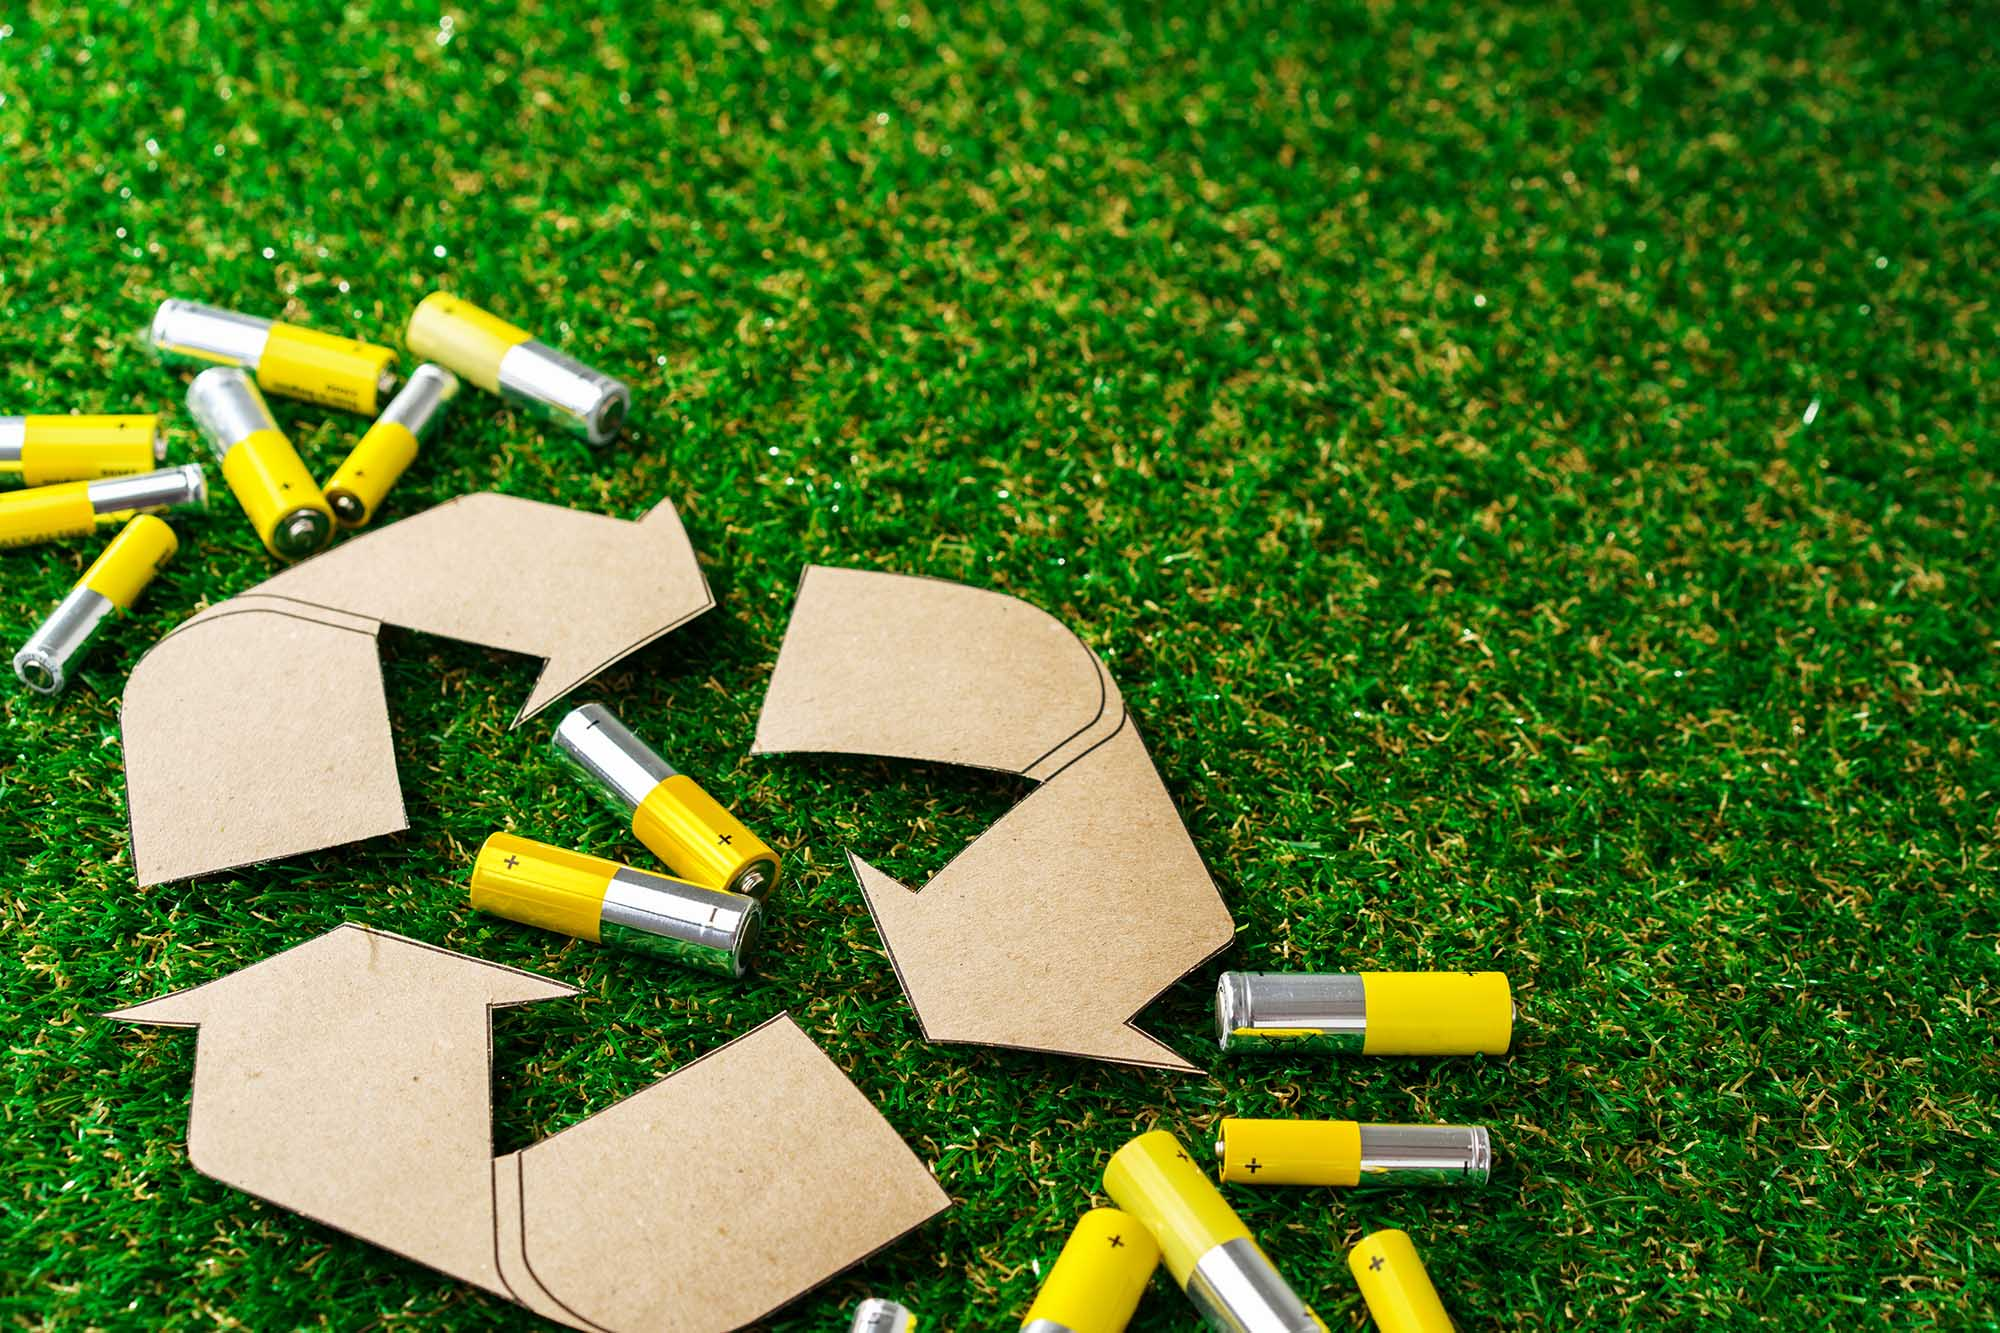 Reciclaje baterias 010721